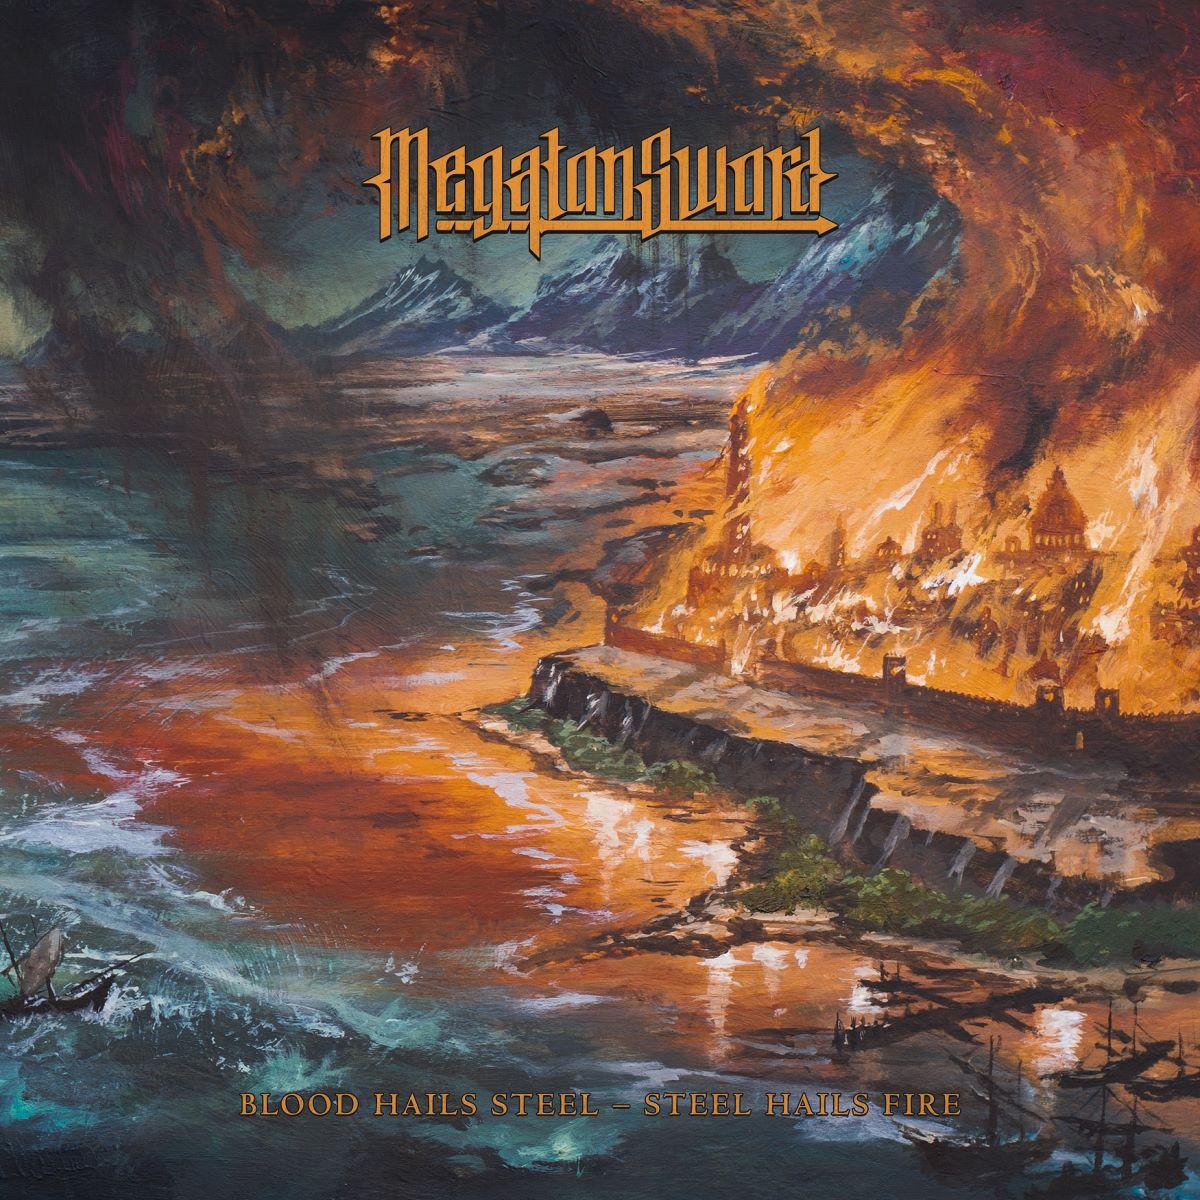 Megaton Sword - Blood Hails Steel Steel Hails Fire - album cover